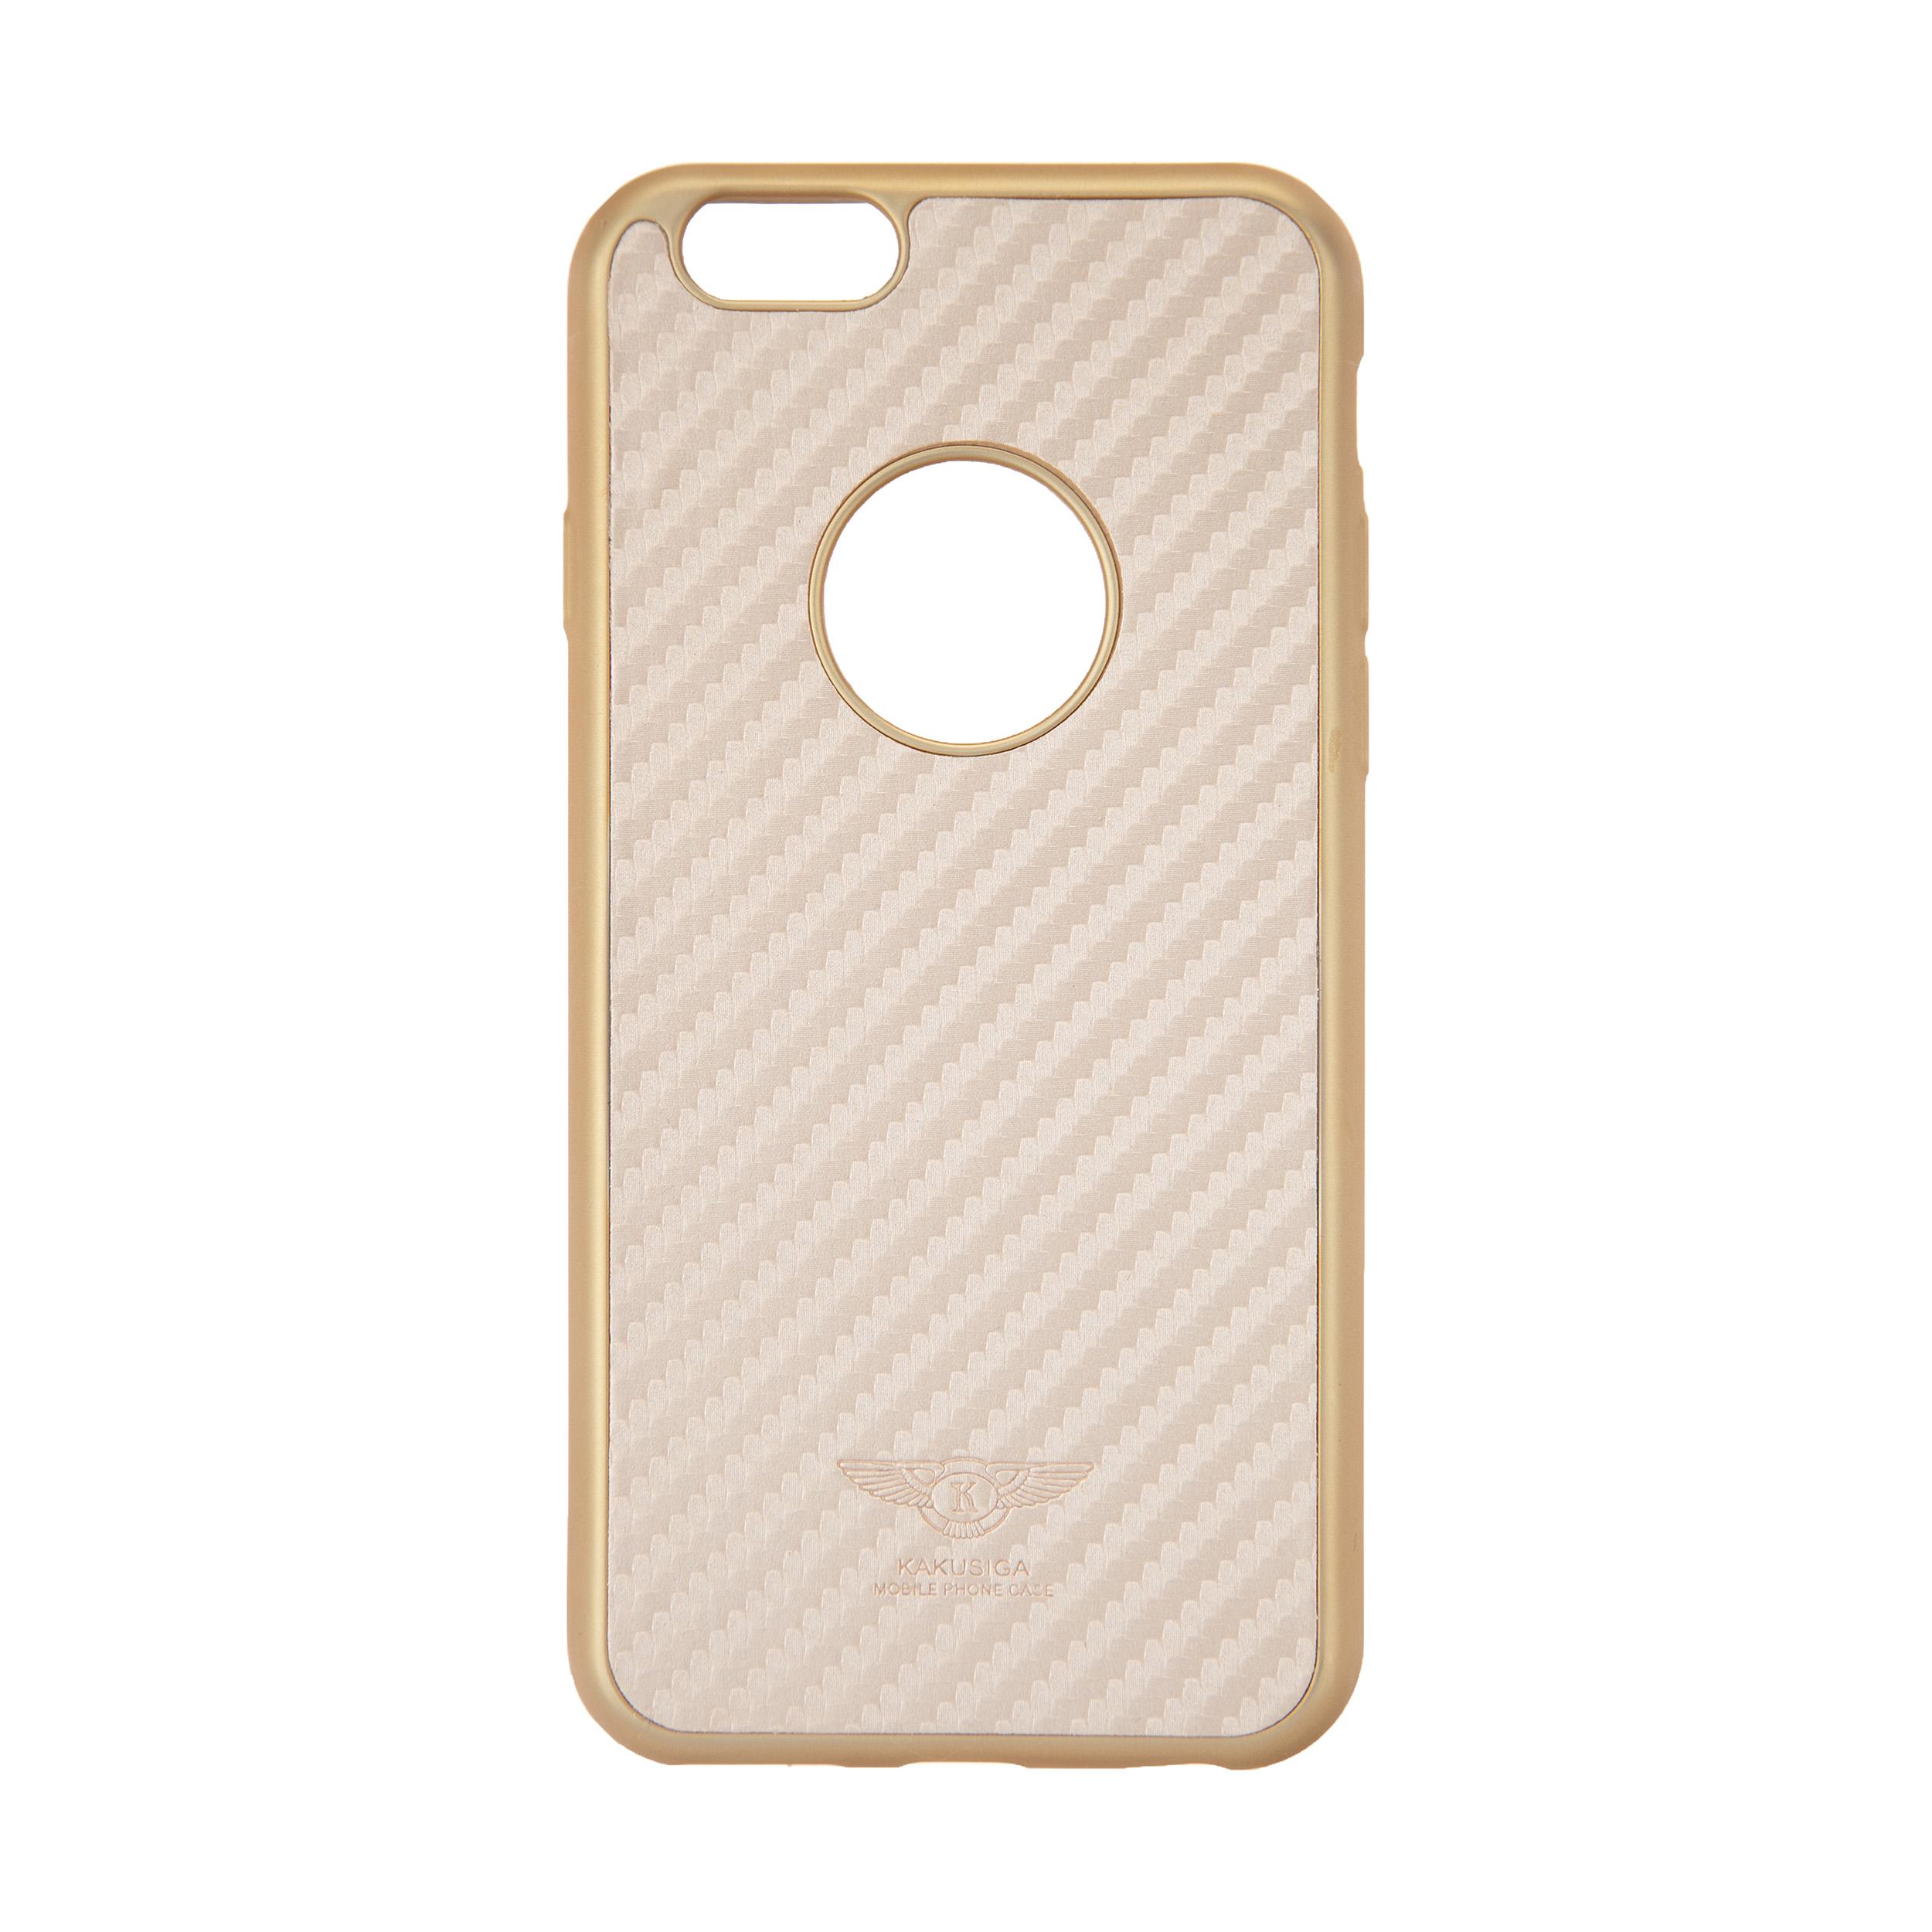 کاور ایکاکو مدل SJK-WH01 مناسب برای گوشی موبایل اپل iPhone 6 / 6s